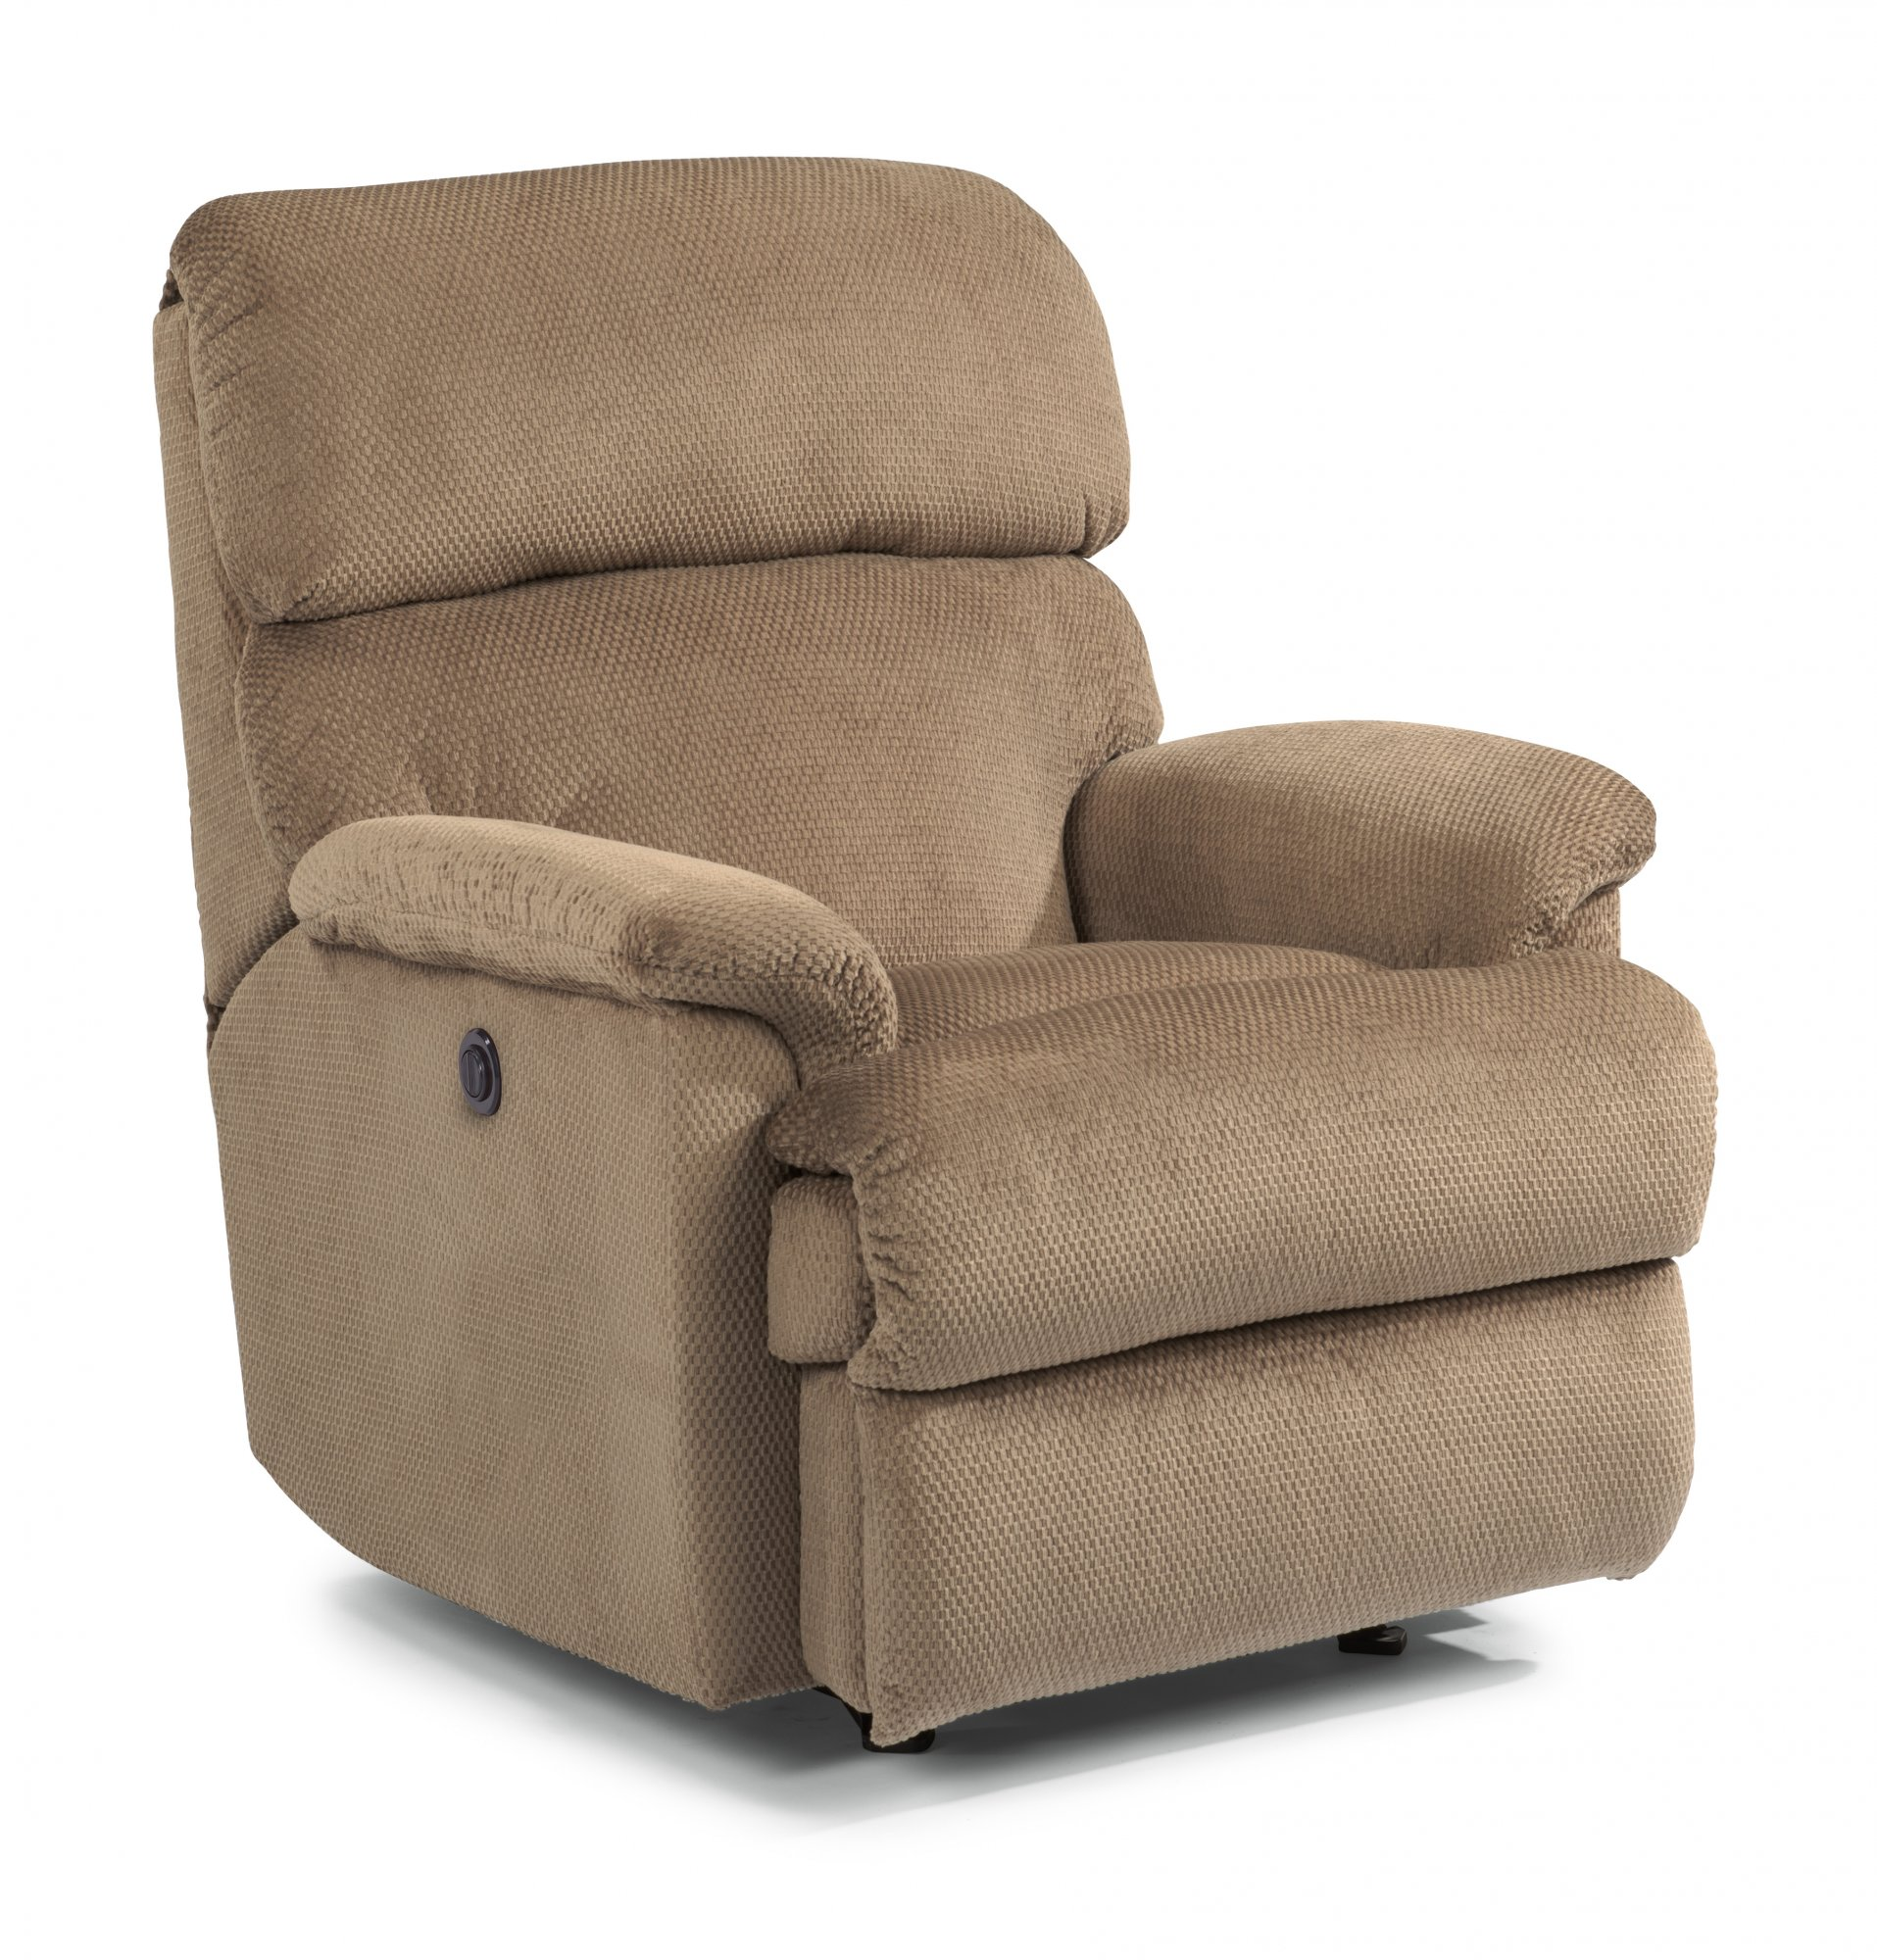 Astonishing Flexsteel 2266 500M Chicago Fabric Power Recliner Evergreenethics Interior Chair Design Evergreenethicsorg